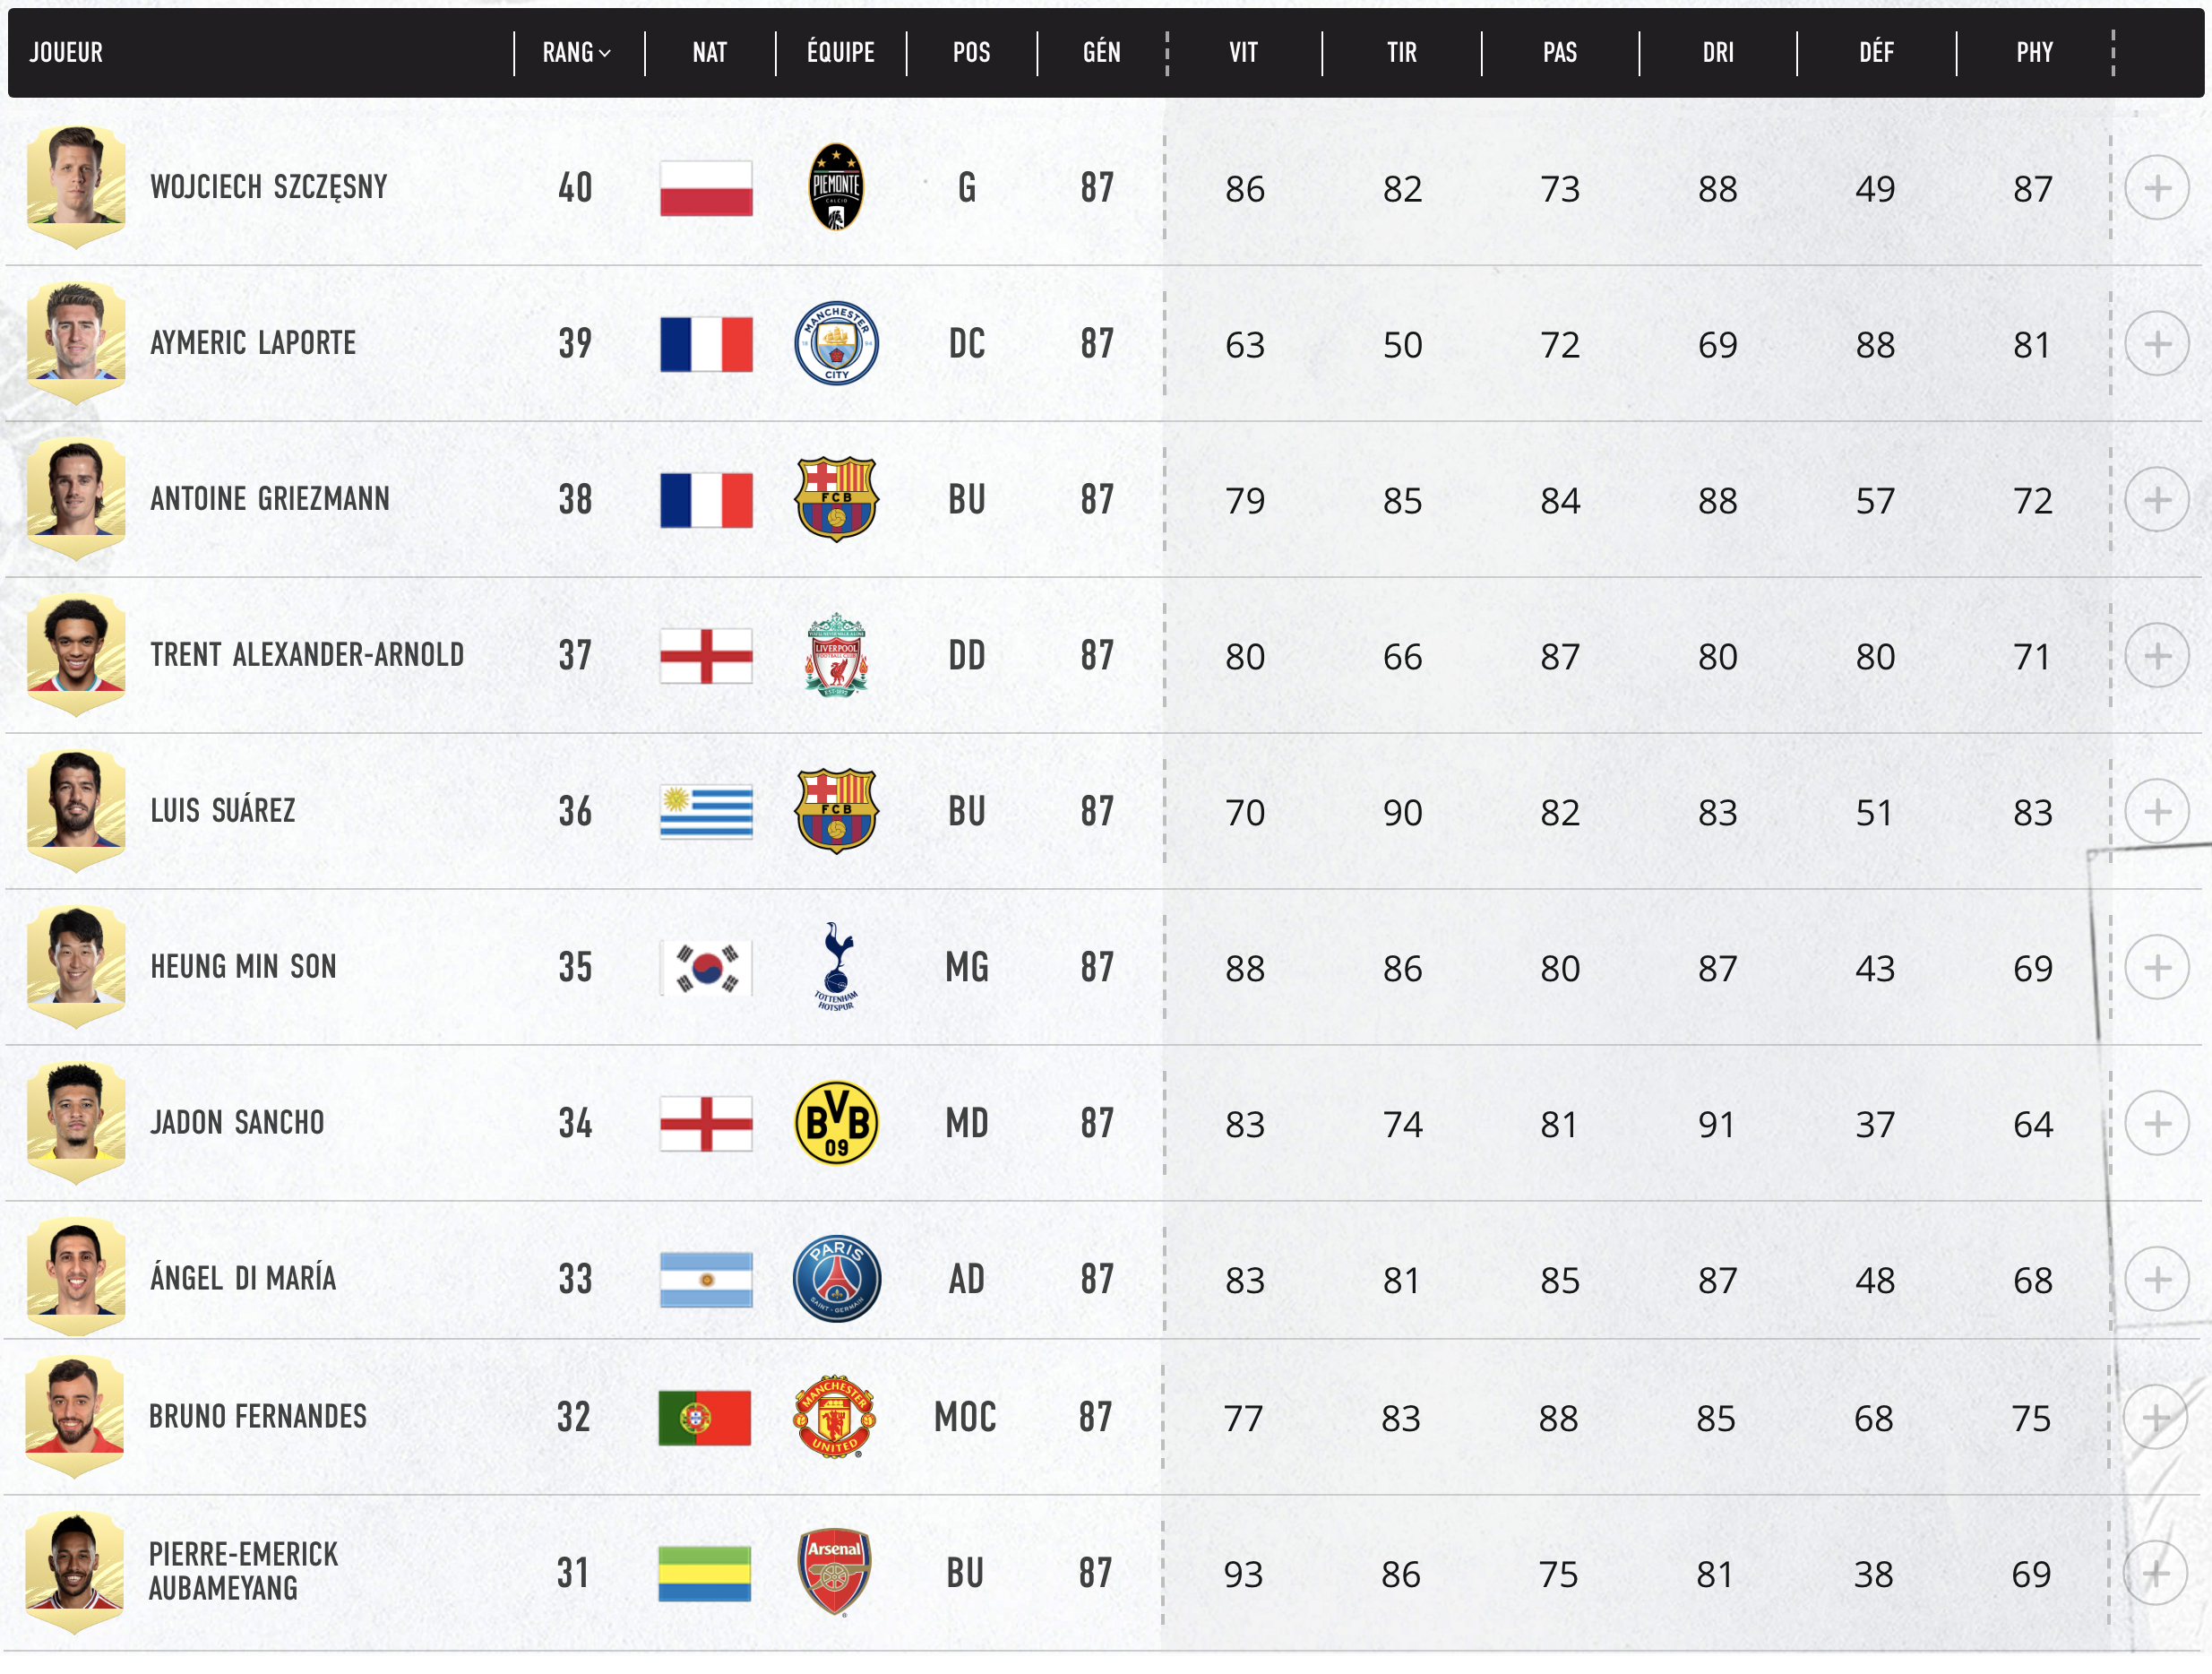 Top 40- 31 Meilleurs Joueurs FIFA 21